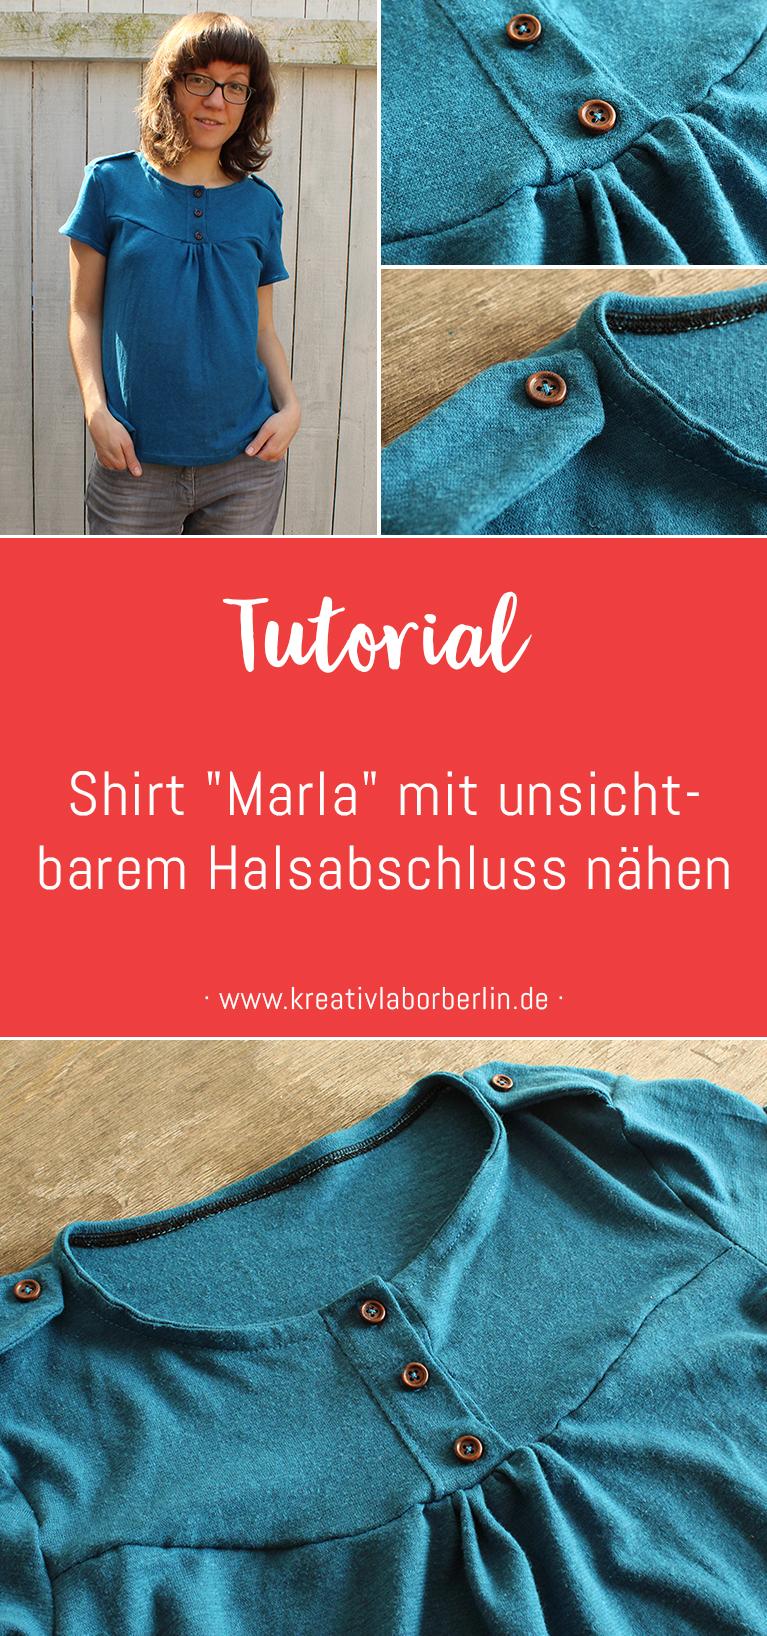 "Shirt ""Marla"" mit unsichtbarem Halsabschluss nähen"